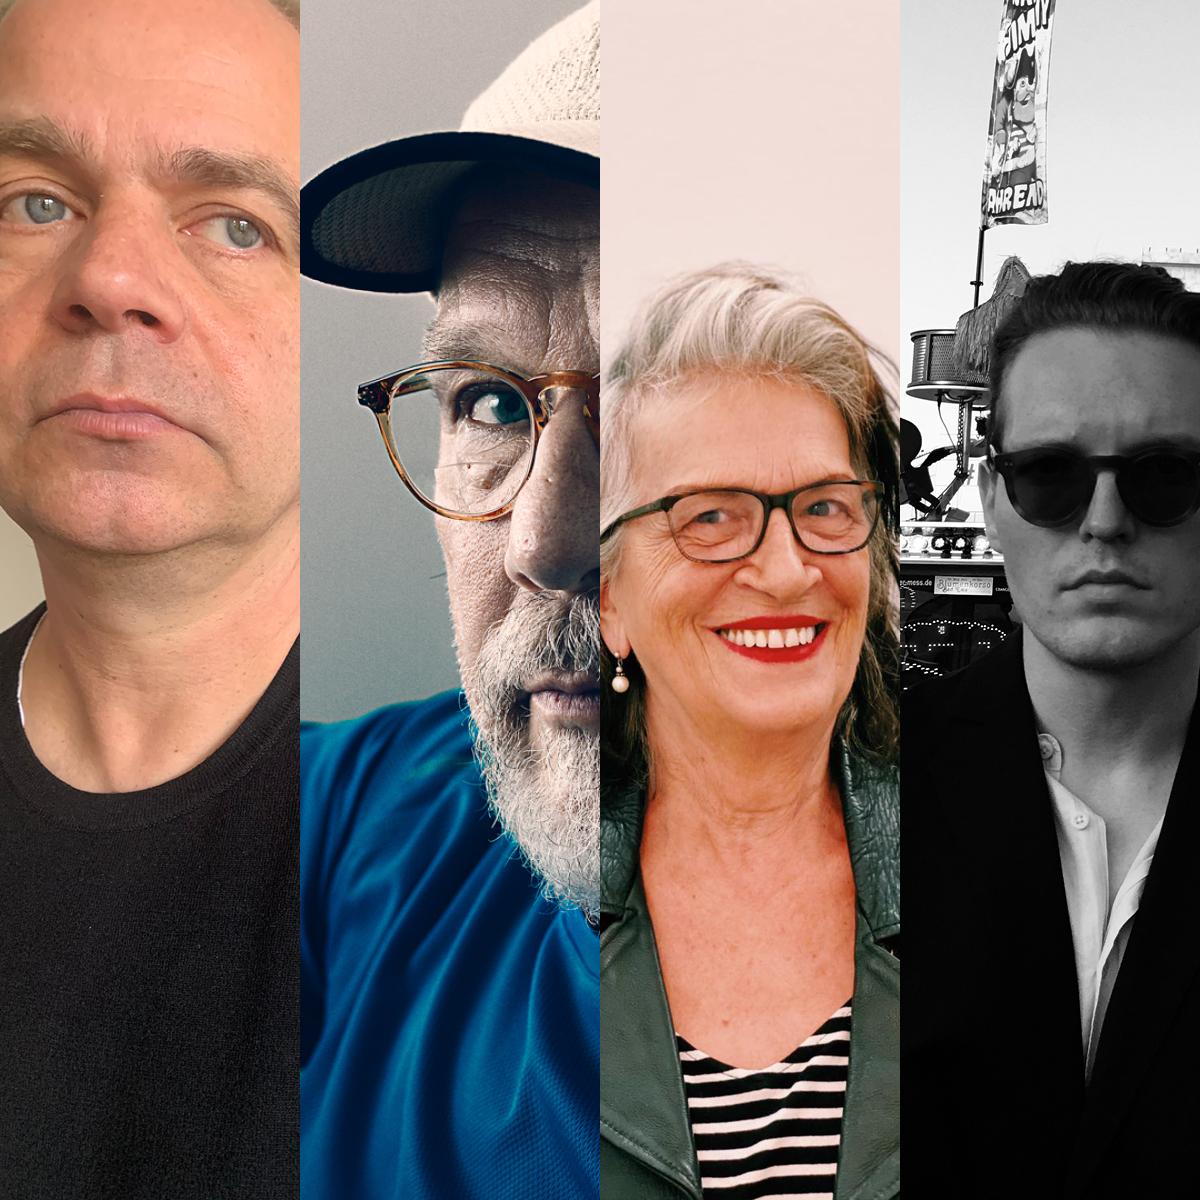 Christoph Dallach, Harald Grosskopf, Renate Knaup, Daniel Jahn